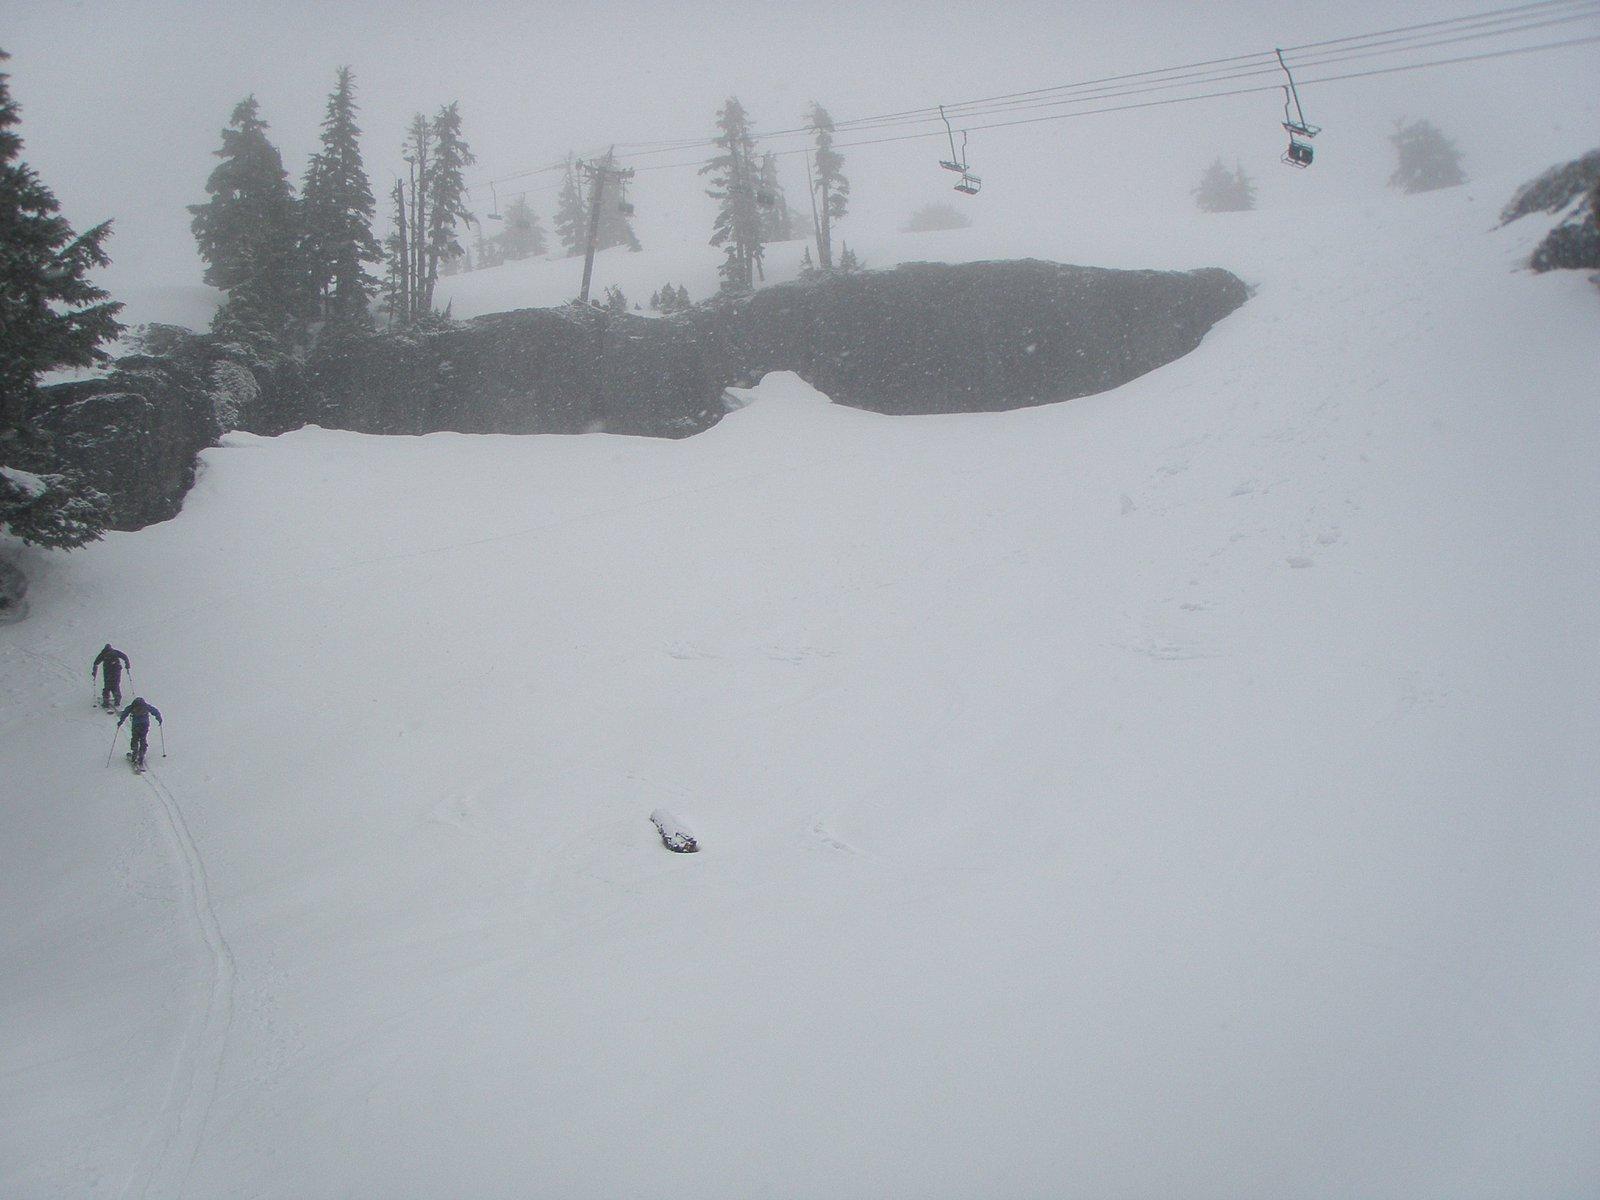 Alpental June 9, 2012